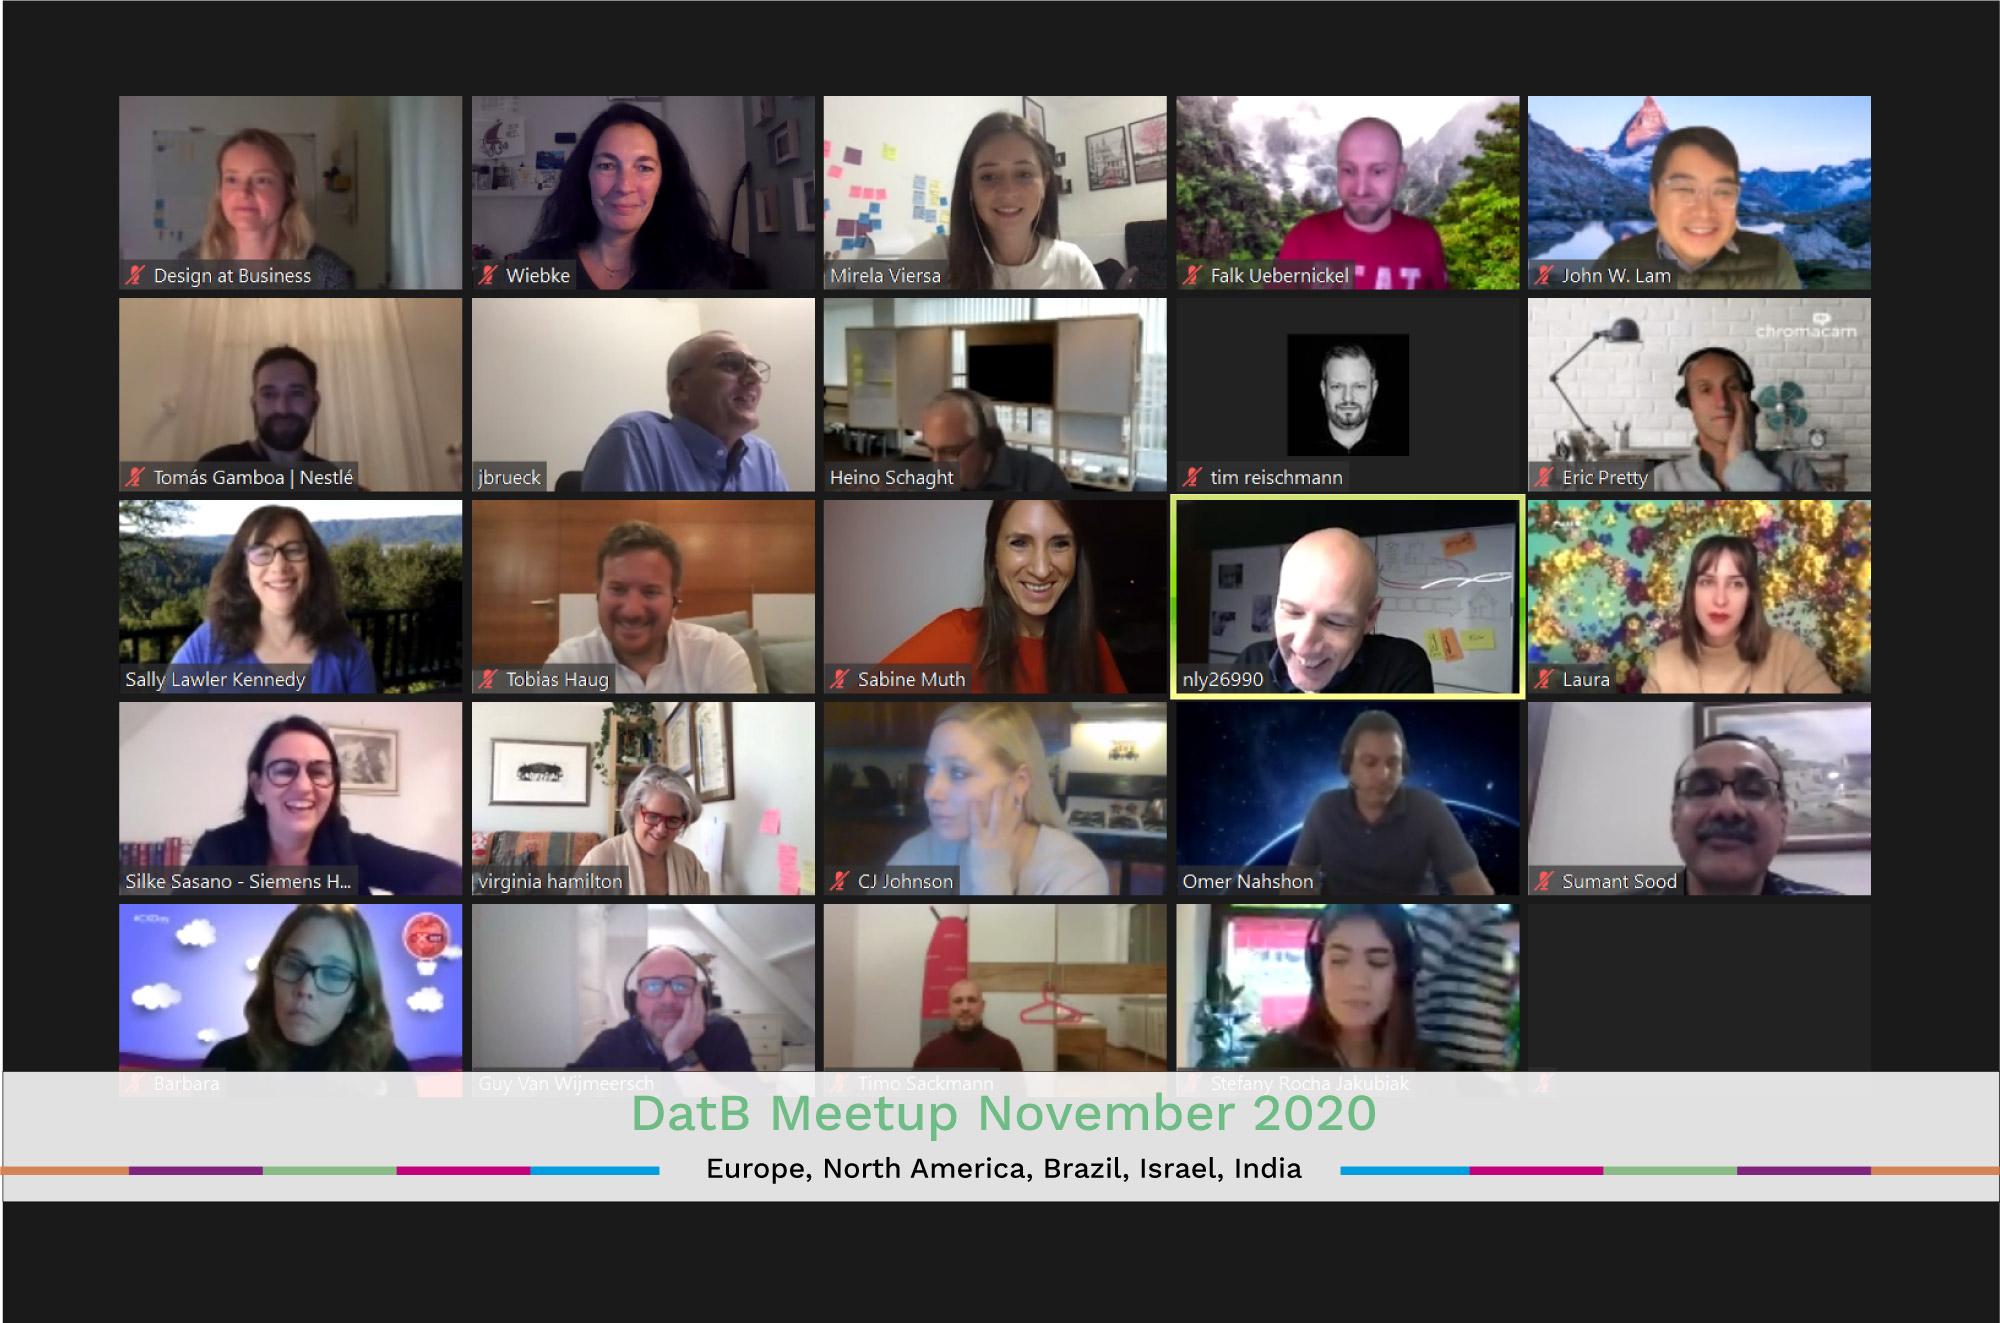 Global Virtual Meetup November 2020